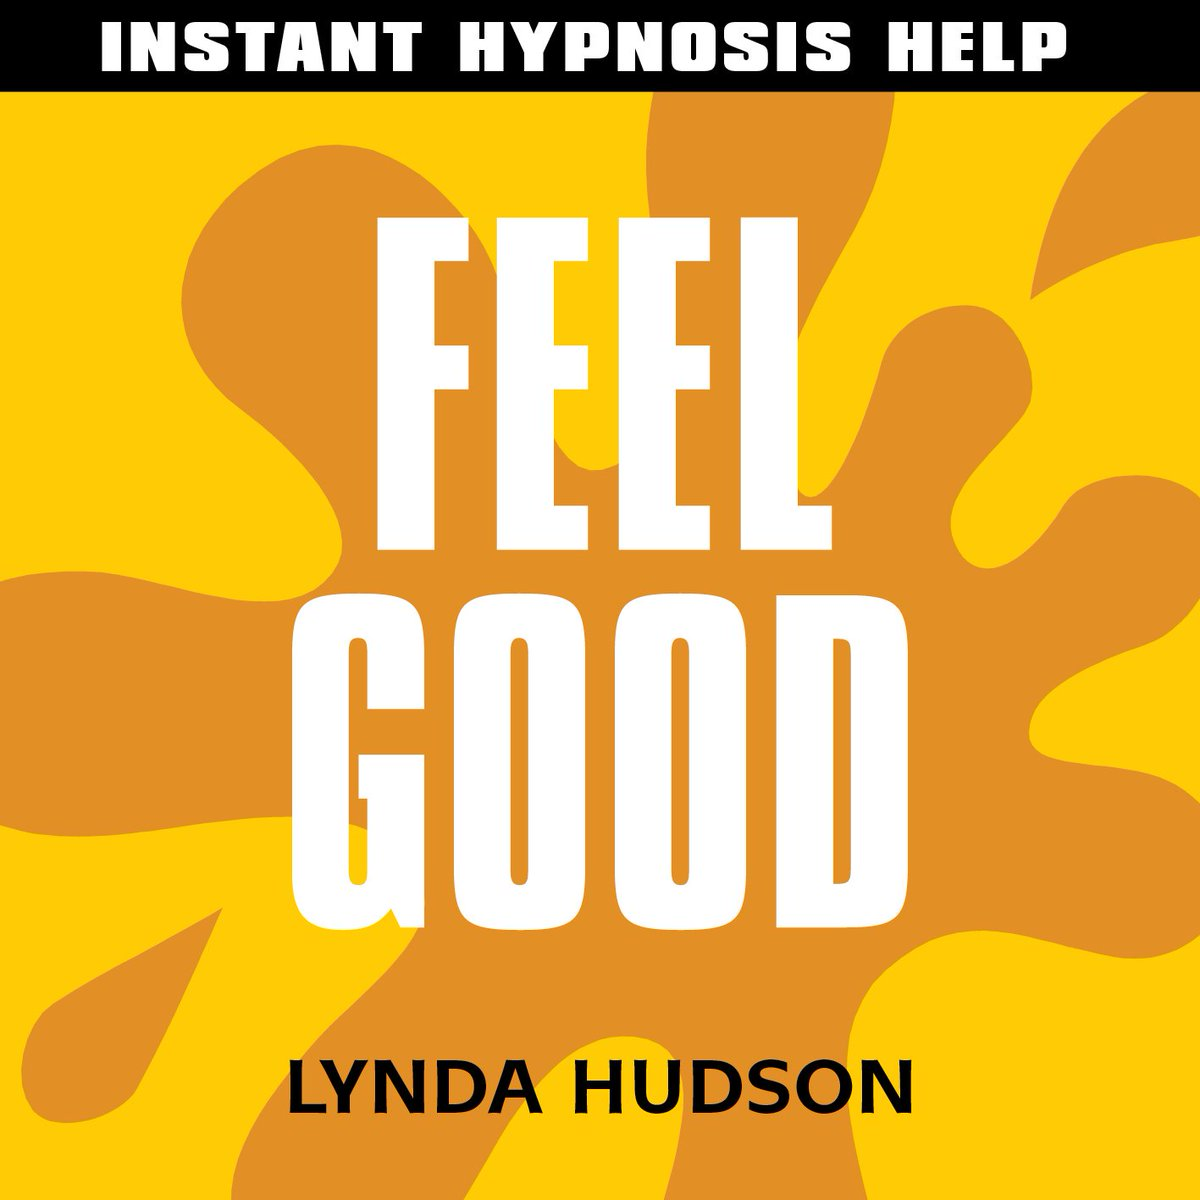 Lynda Hudson on Twitter: